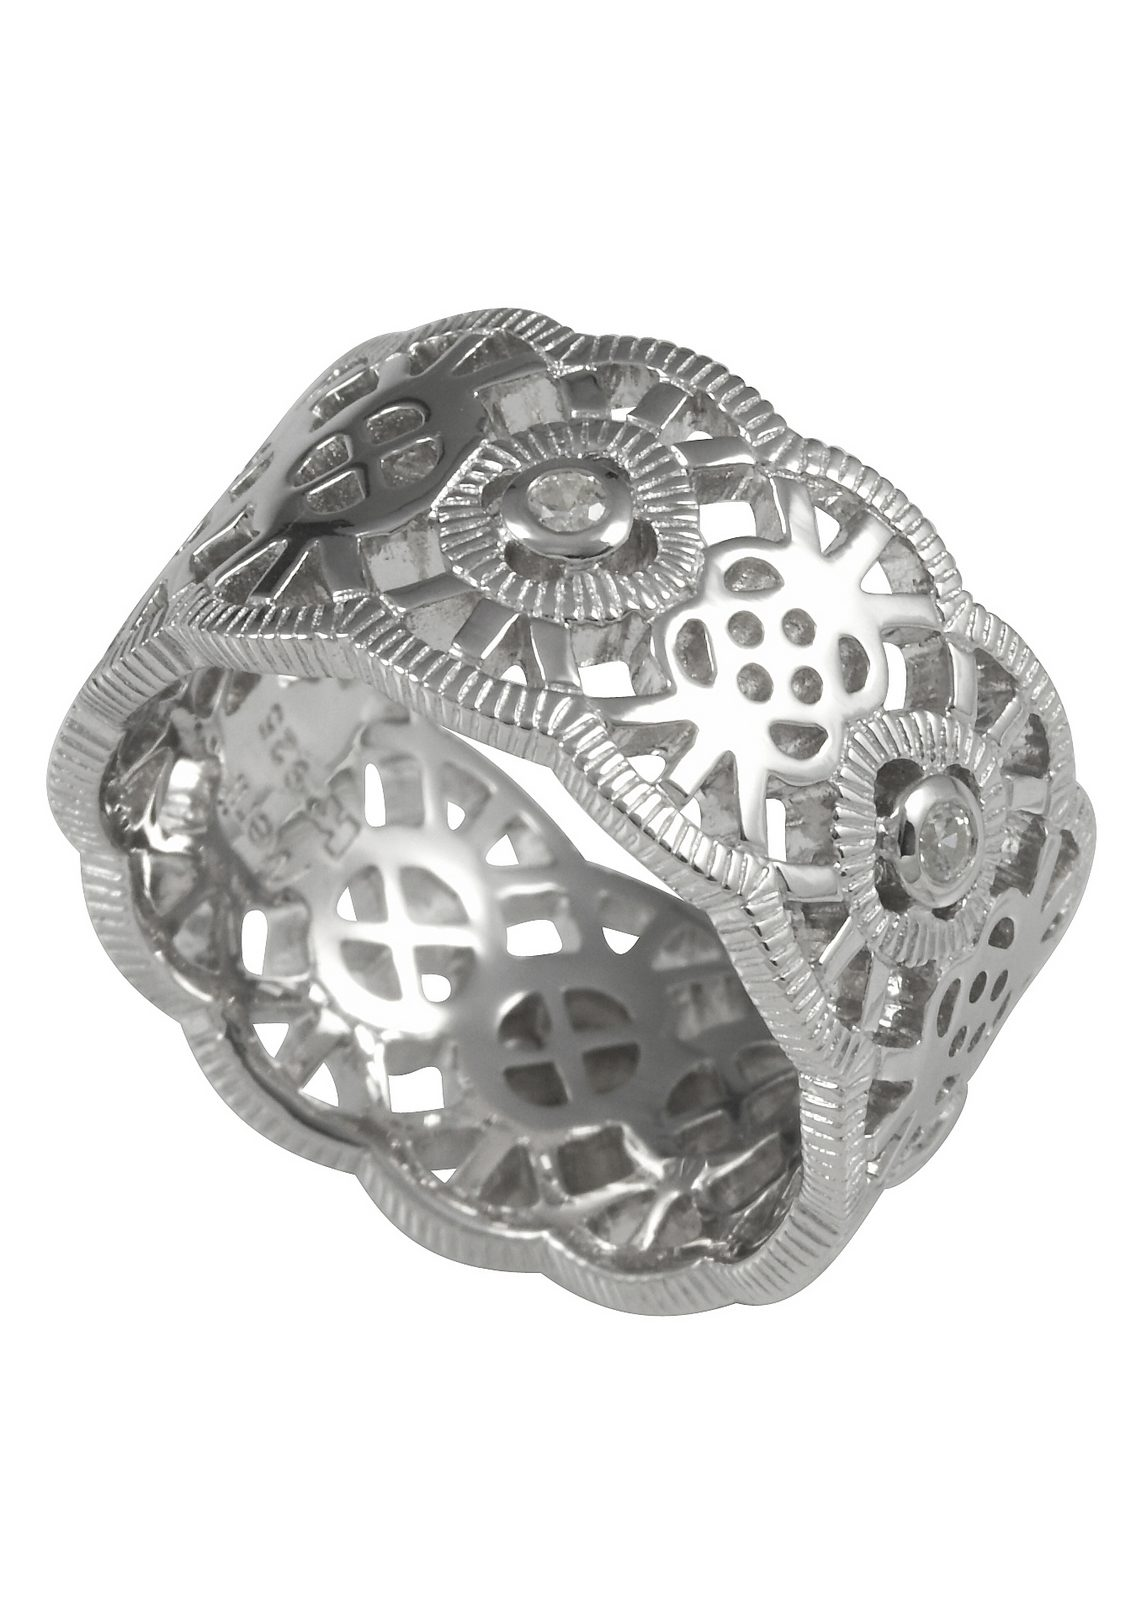 Ring, »M06 13R/90/03«, Merii - broschei